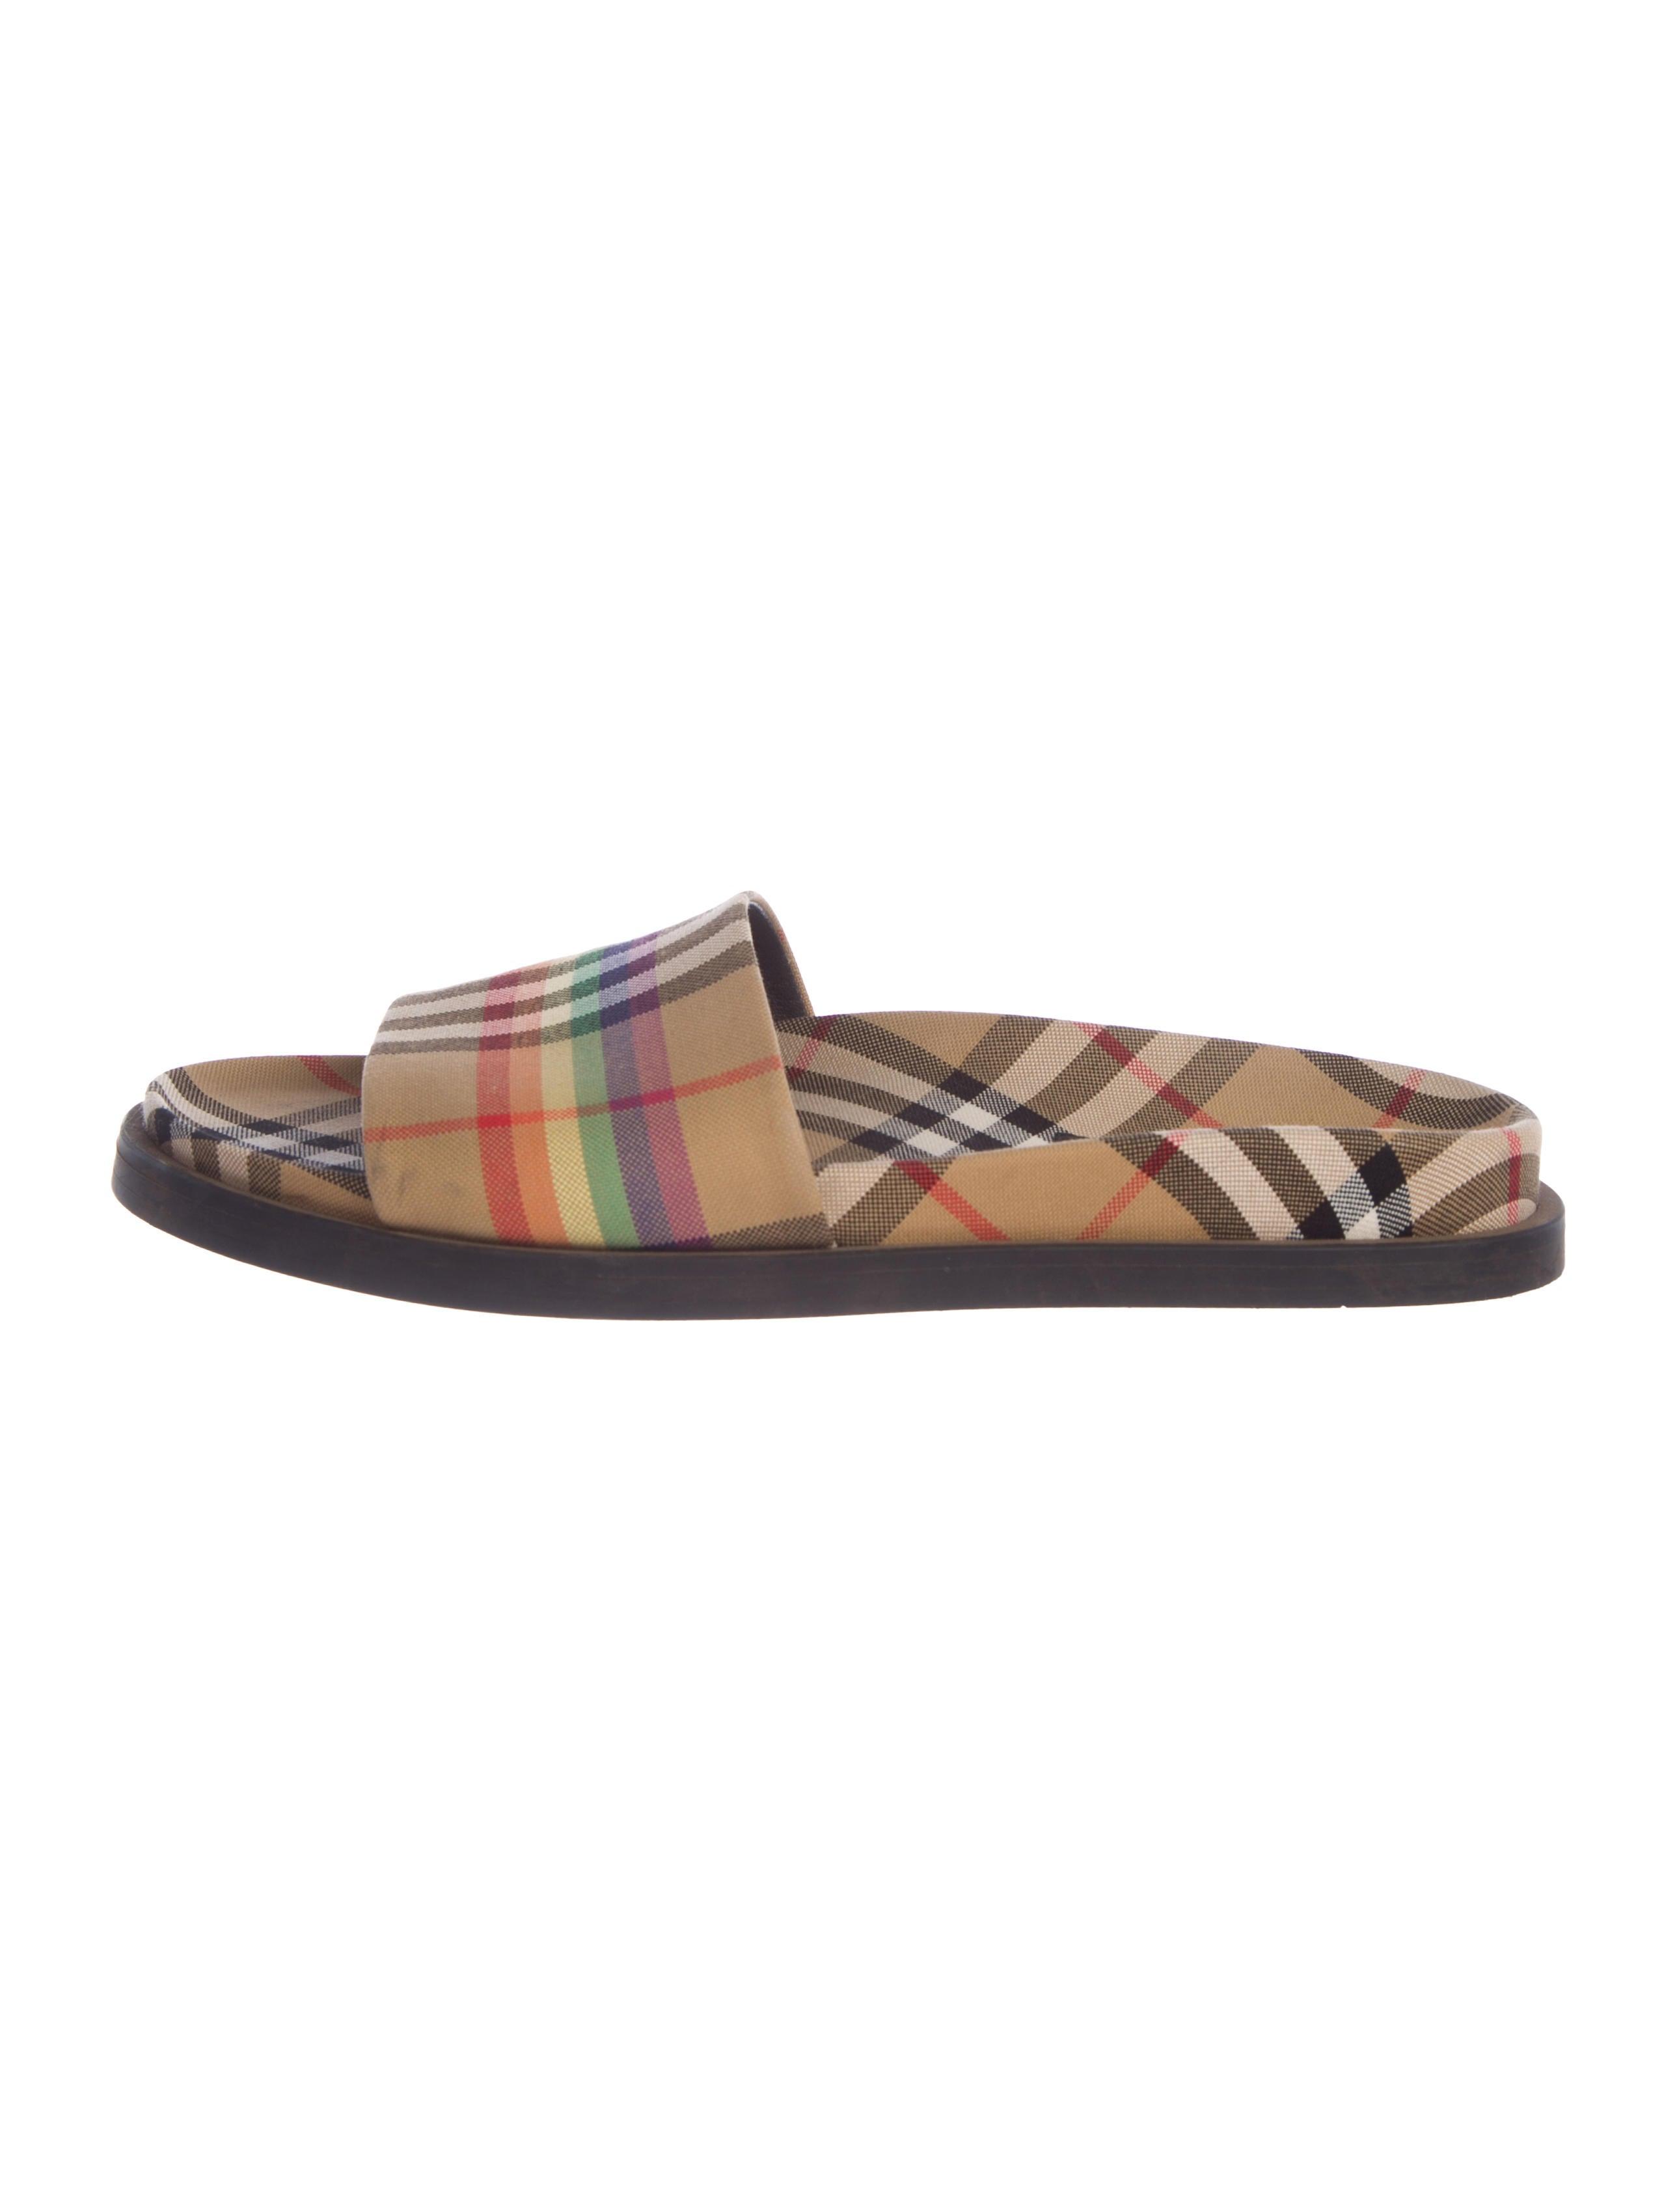 1fafdf54a83 Burberry 2018 Ashmore Rainbow Check Sandals - Shoes - BUR104819 ...